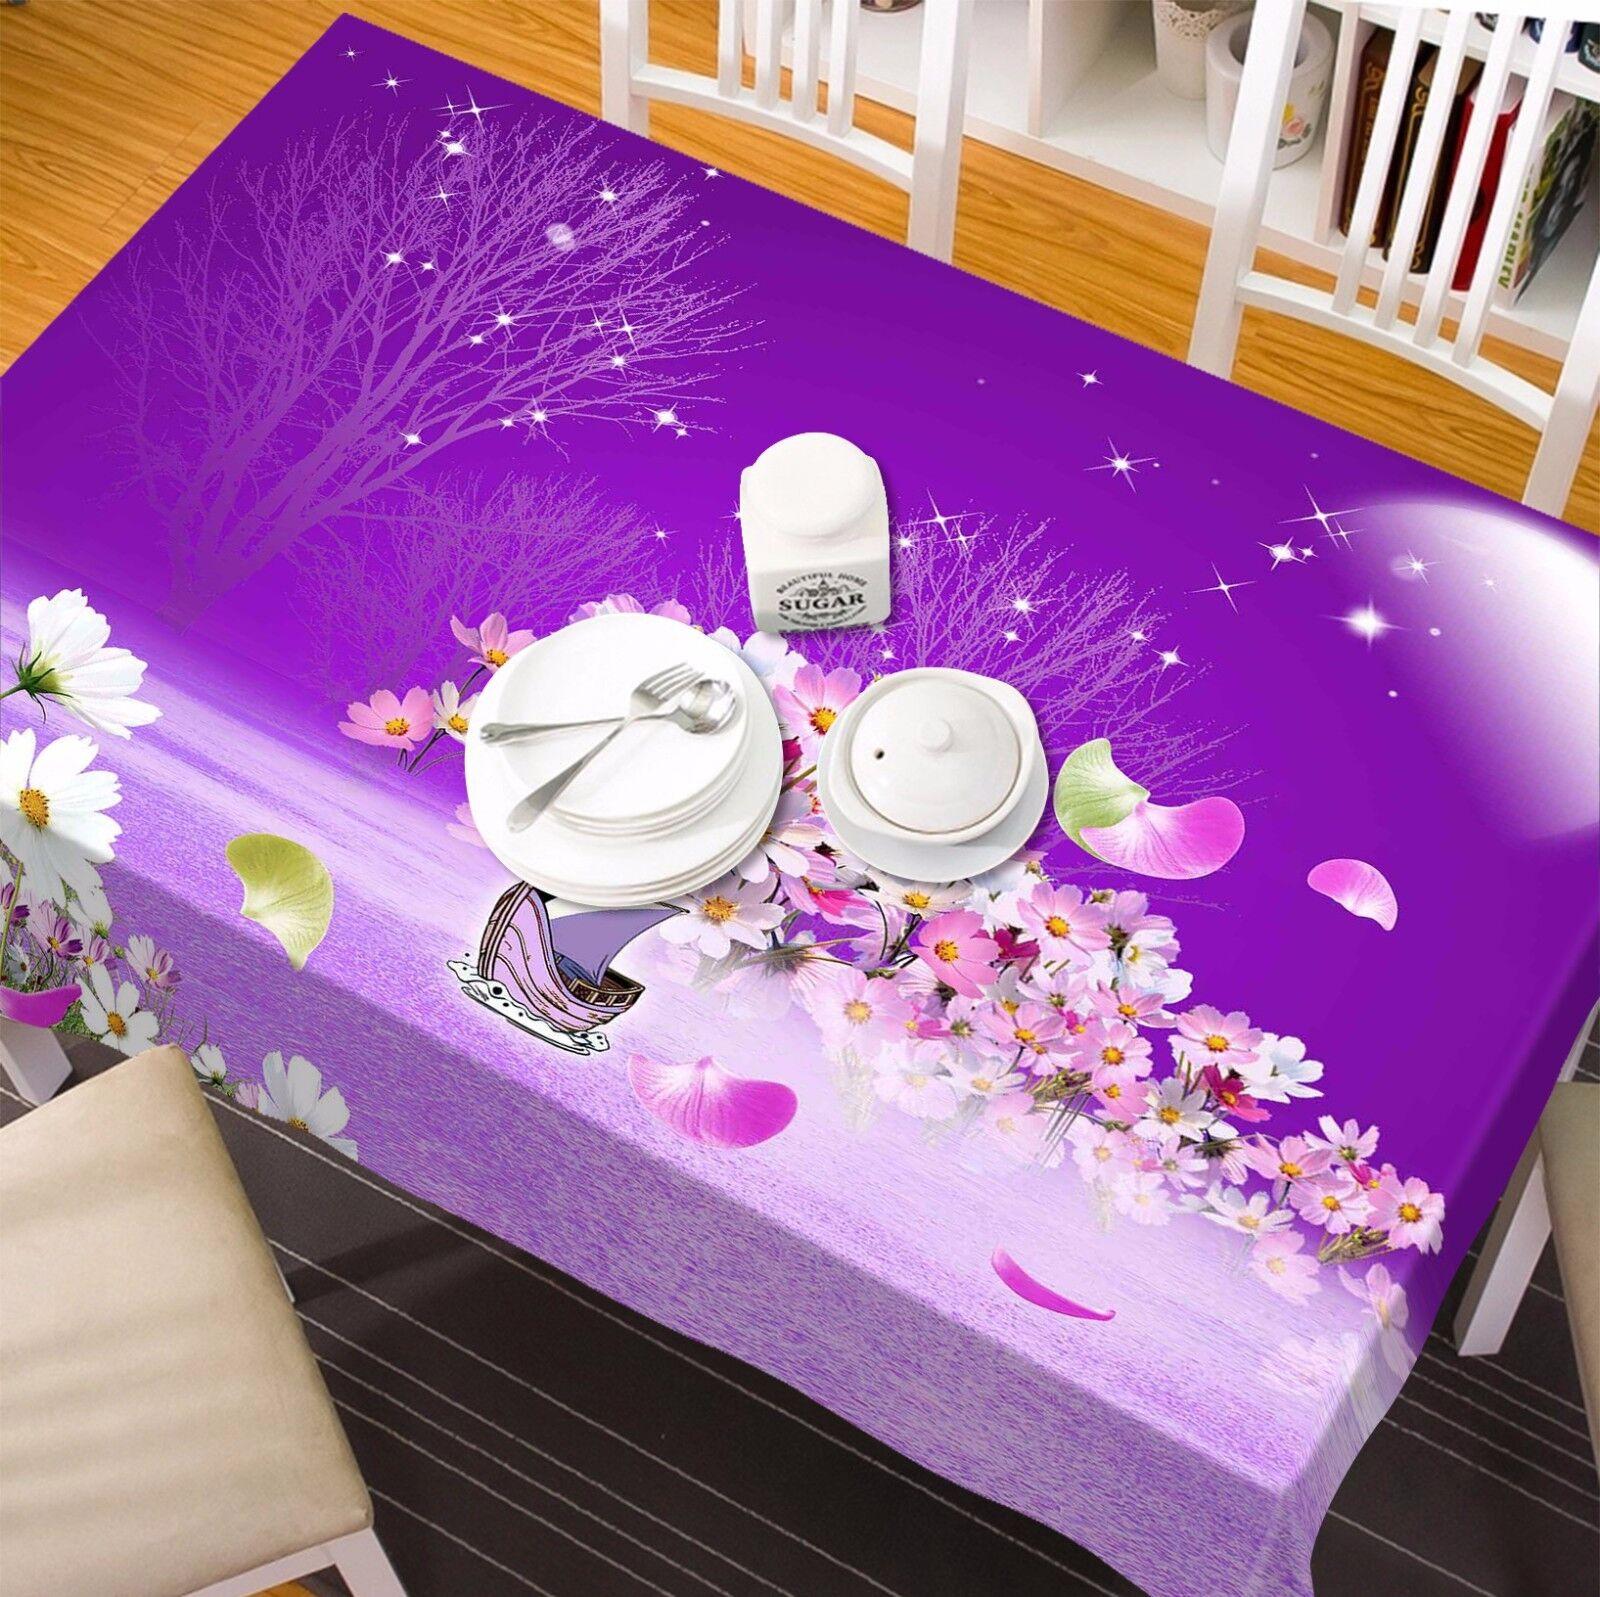 3D lila 4 4 4 Tablecloth Table Cover Cloth Birthday Party AJ WALLPAPER UK Lemon e7336a